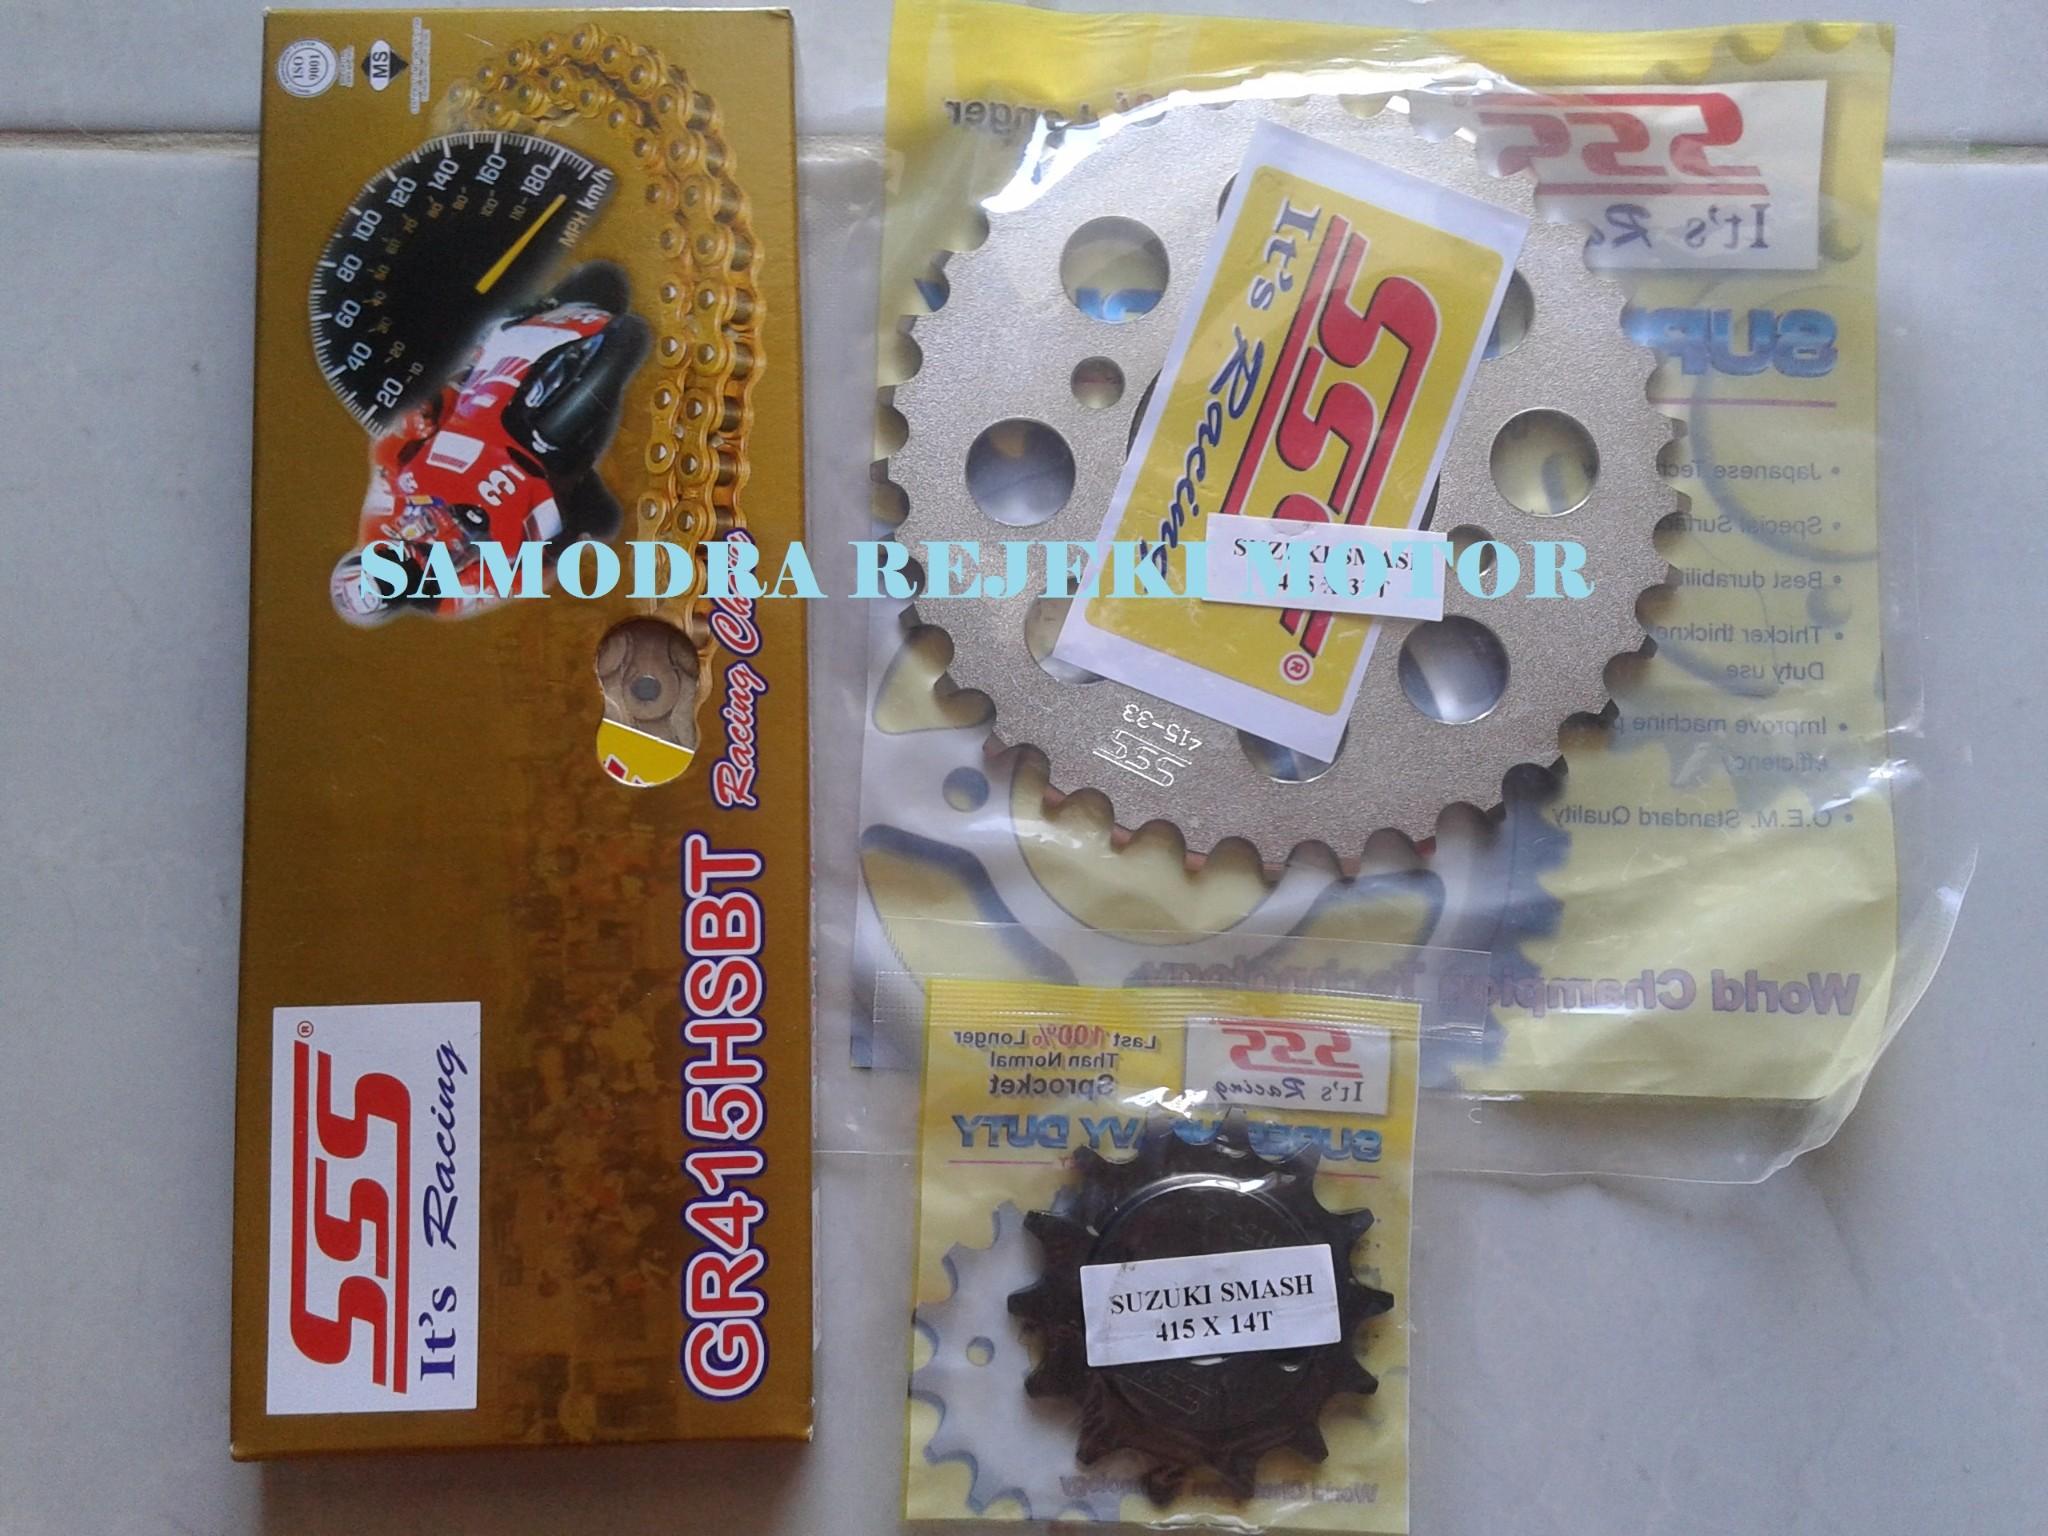 Jual Gir Set Sss Honda Blade Revo Absolute Ukuran 415 Samodra Gear Motor Vixion New Rantai Warna Rejeki Tokopedia